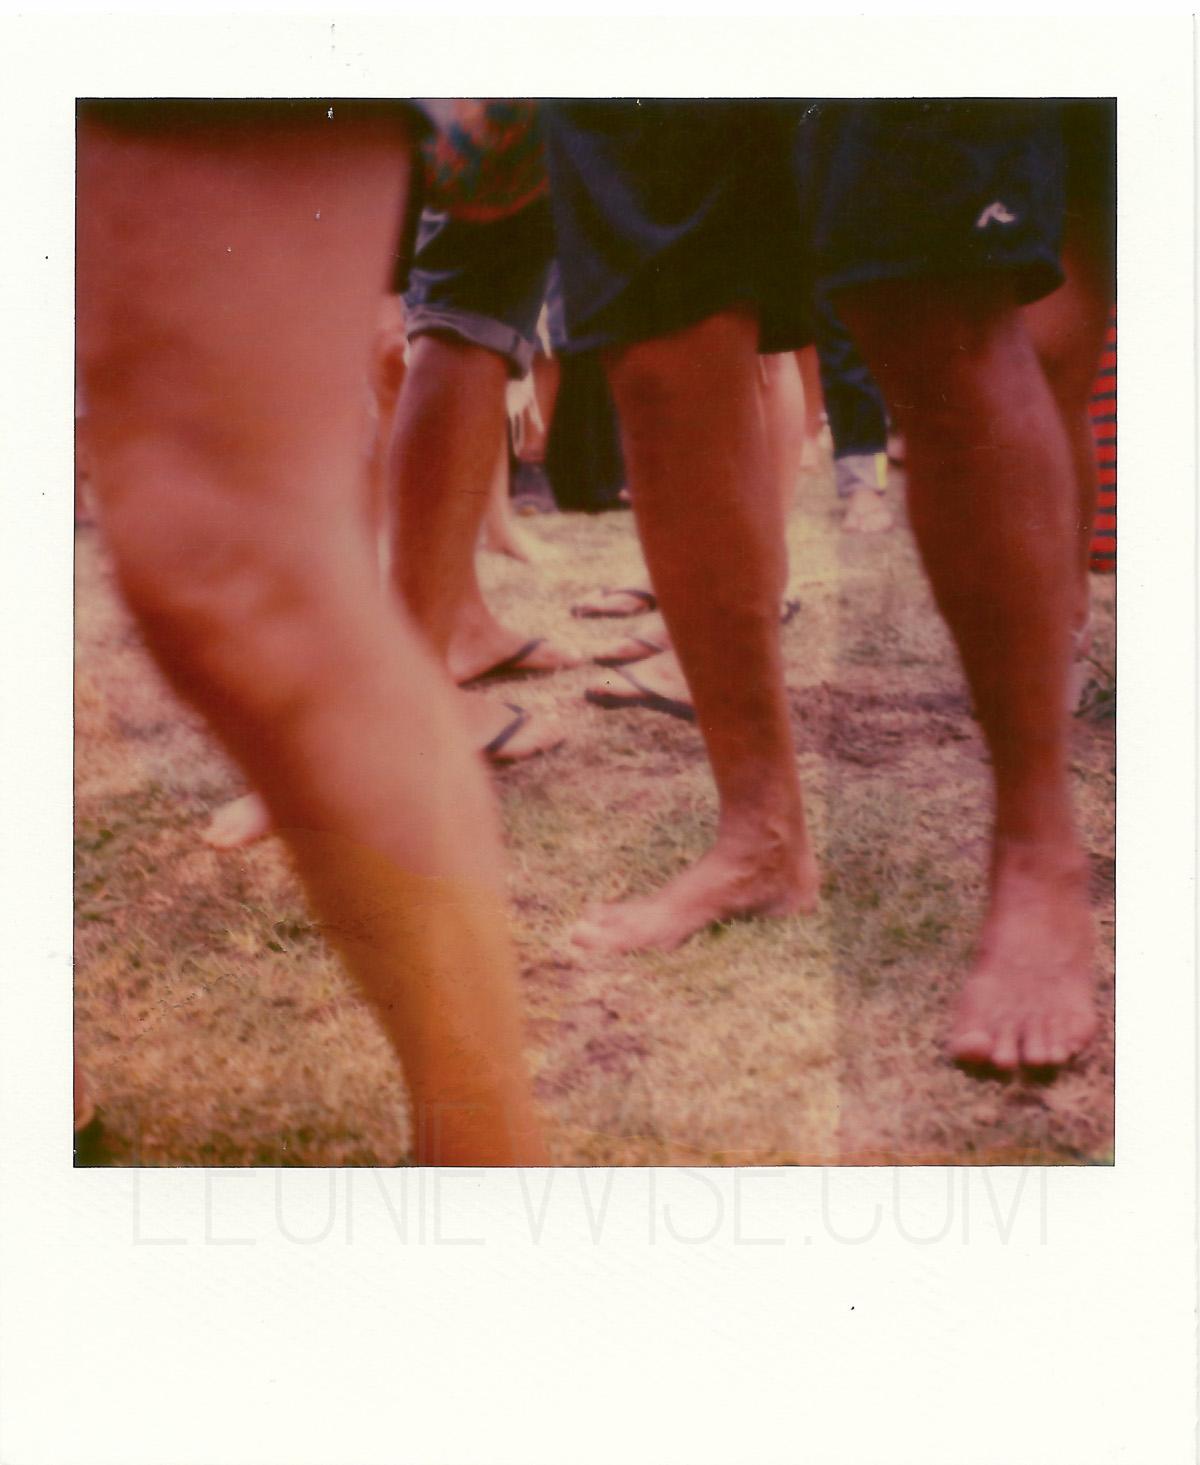 MusicAtMatua_Polaroid-SX70_Impossible-PX70_leoniewise-5